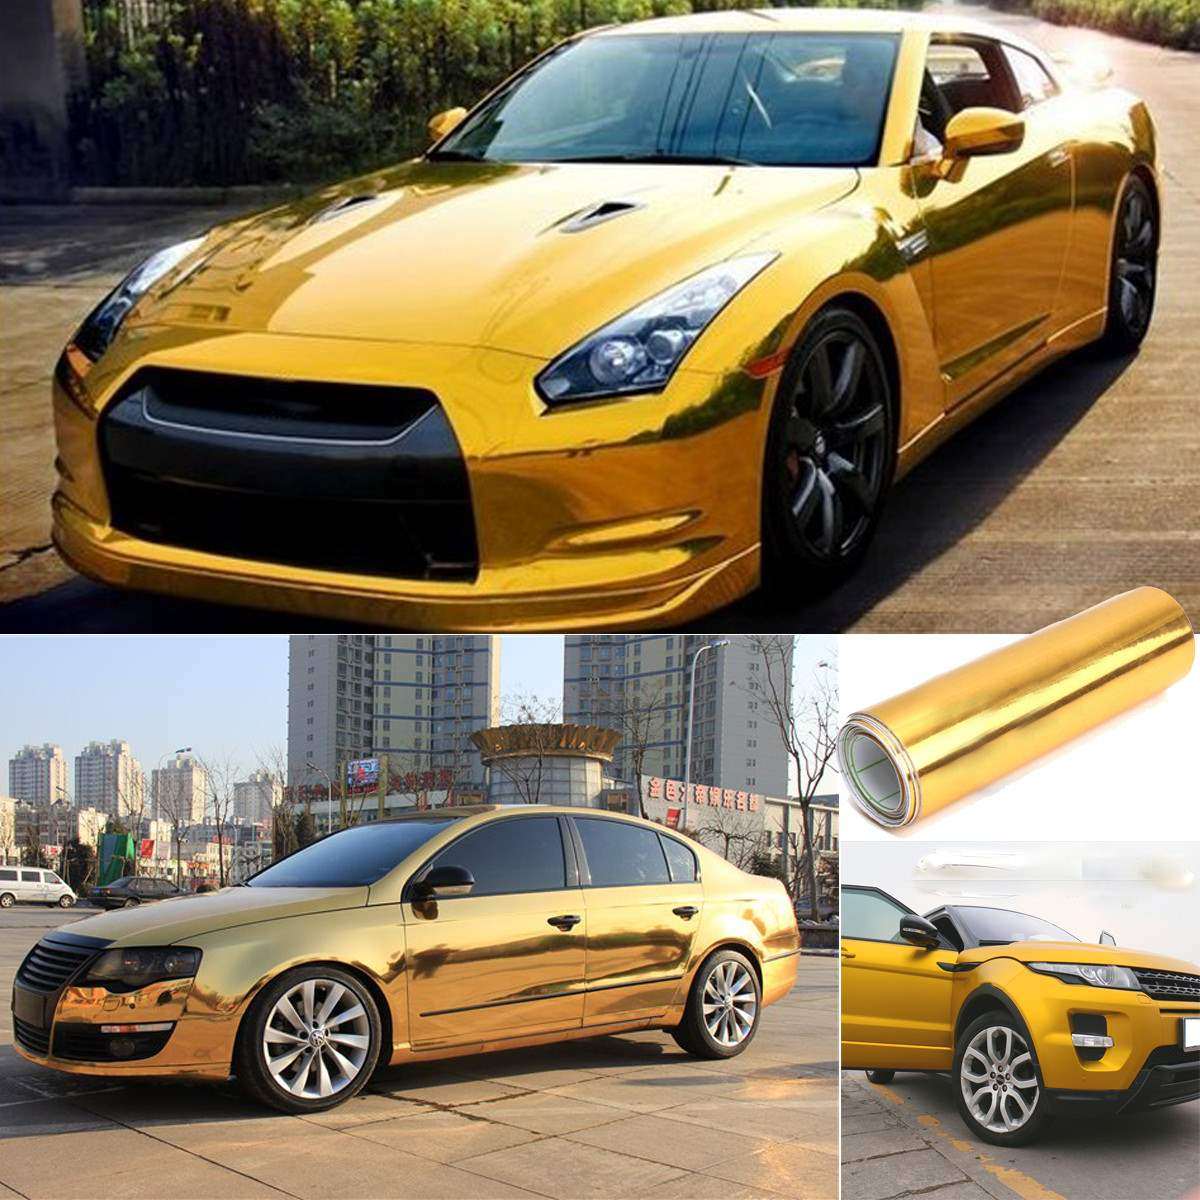 Gold Golden Chrome Mirror Vinyl Wrap Film Car Sticker Decal Bubble Free Air Release DIY Car Styling 10*150cm